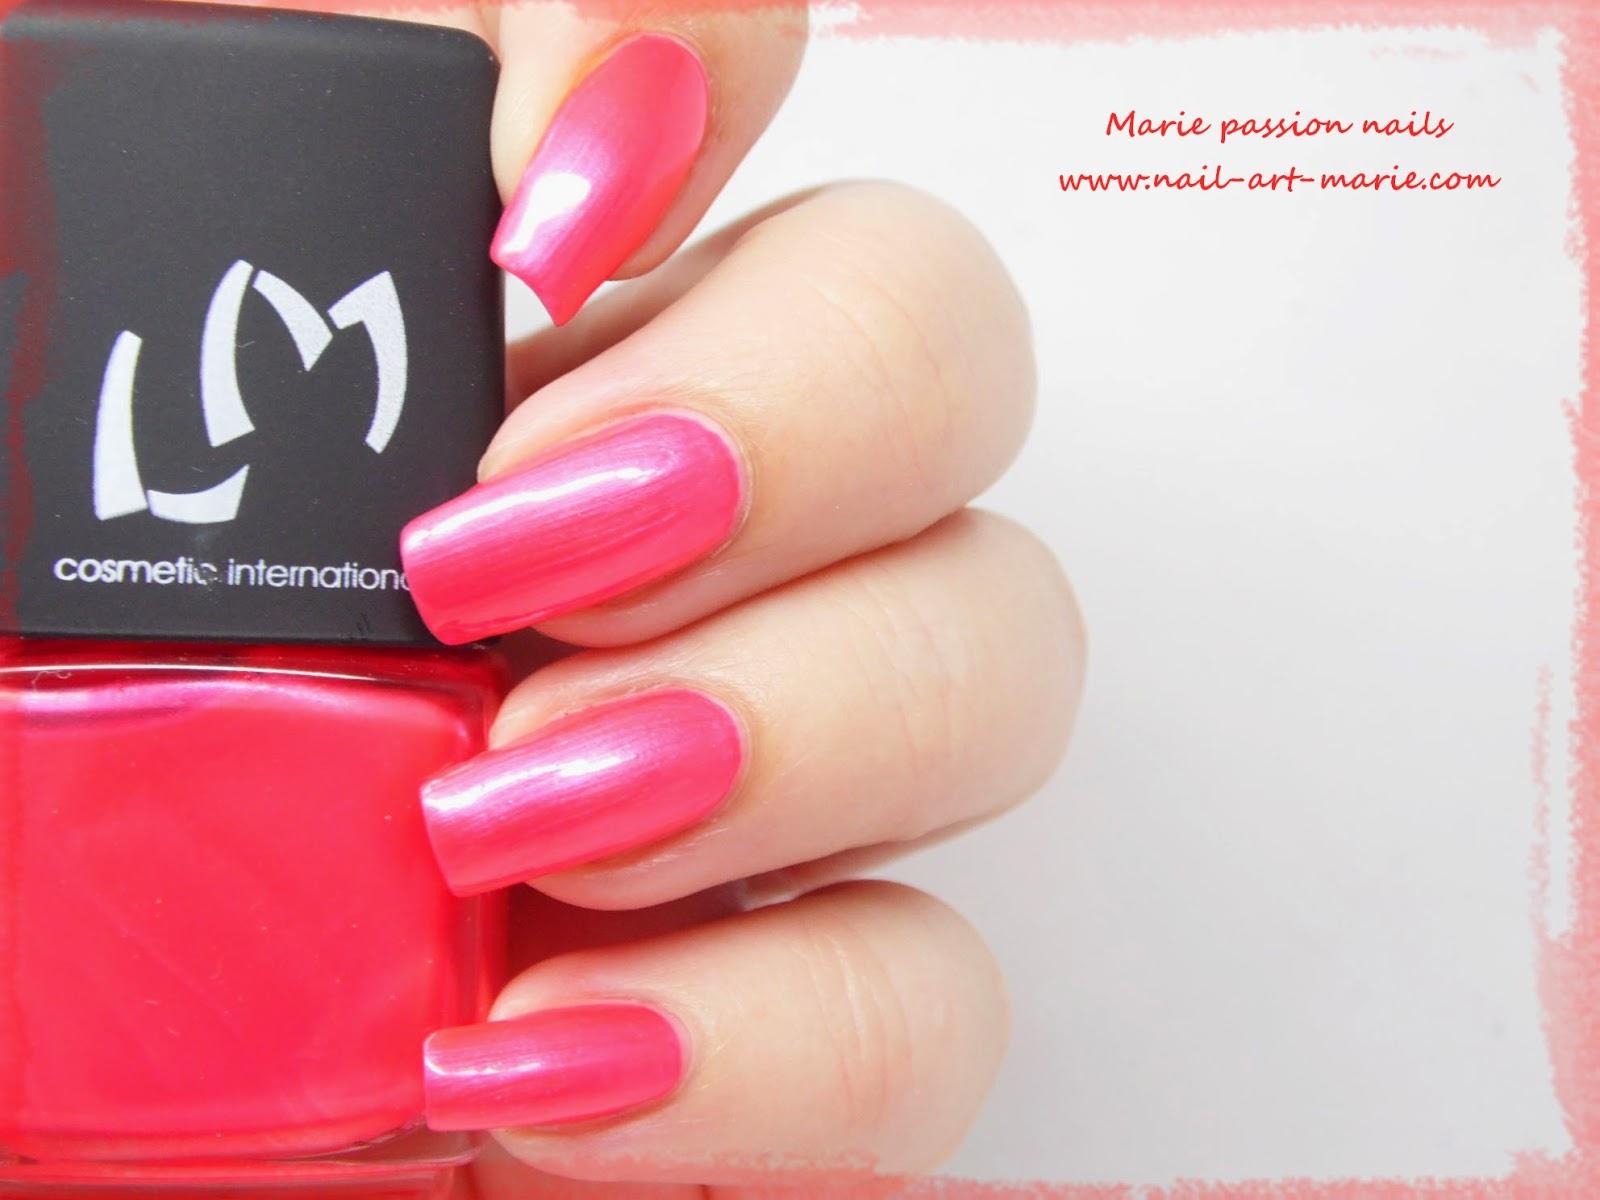 LM Cosmetic Fonte Nova3